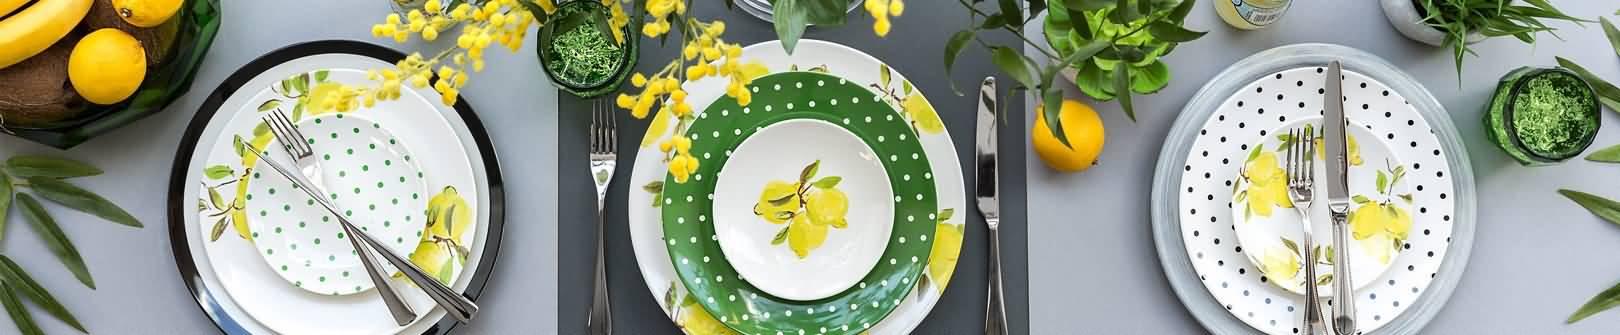 Plastic Bowls & Plates